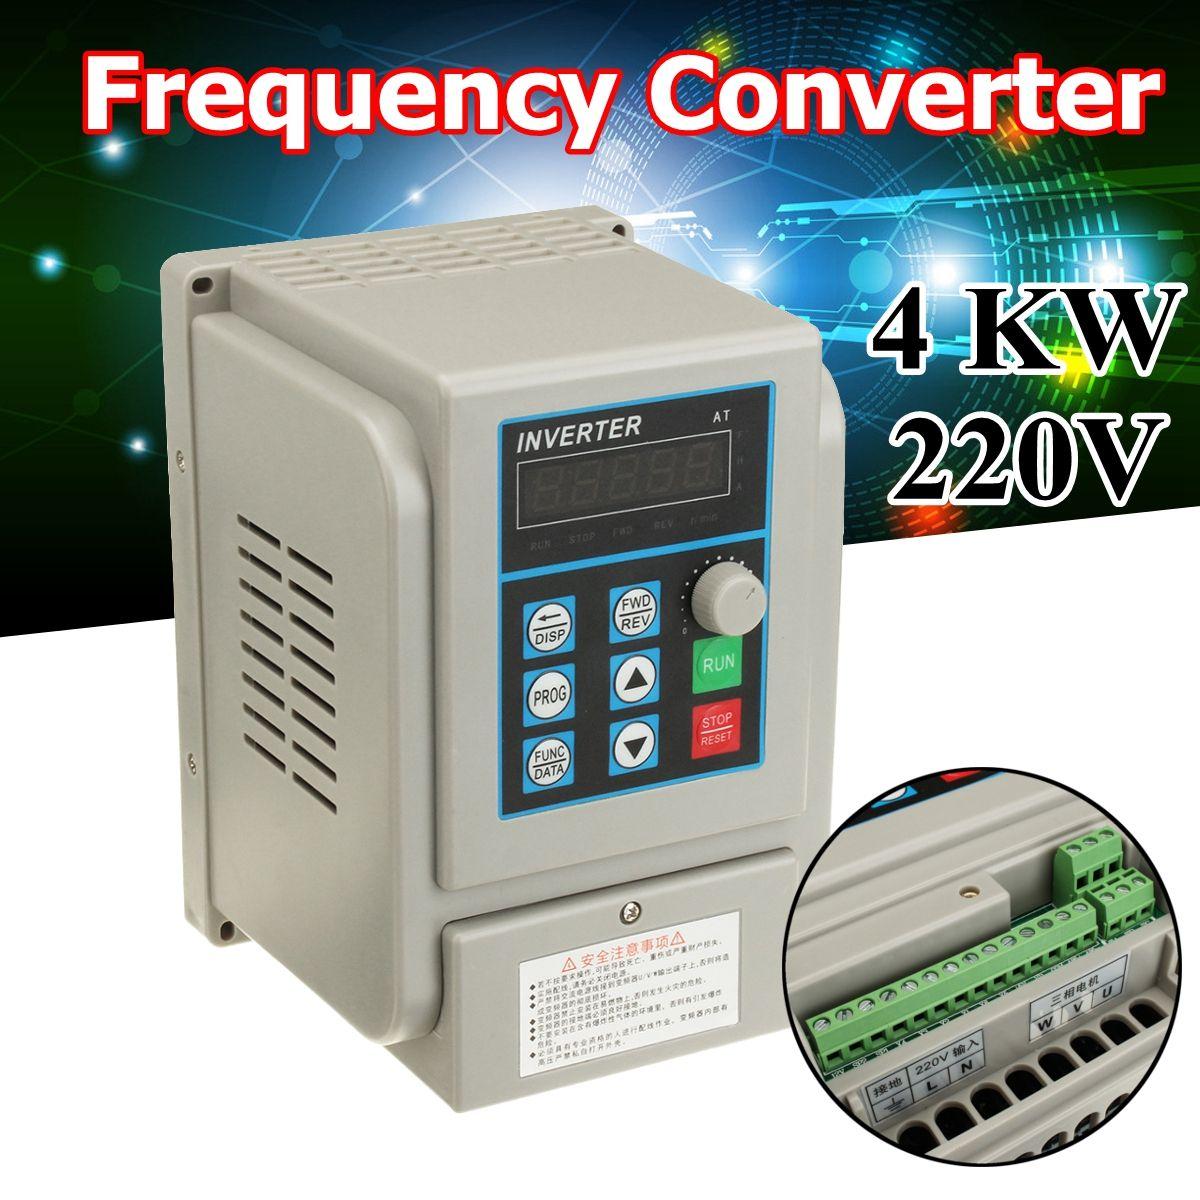 AC 220 v Frequenz Konverter 4KW Variabler Frequenz Umrichter VFD Geschwindigkeit Controller Konverter